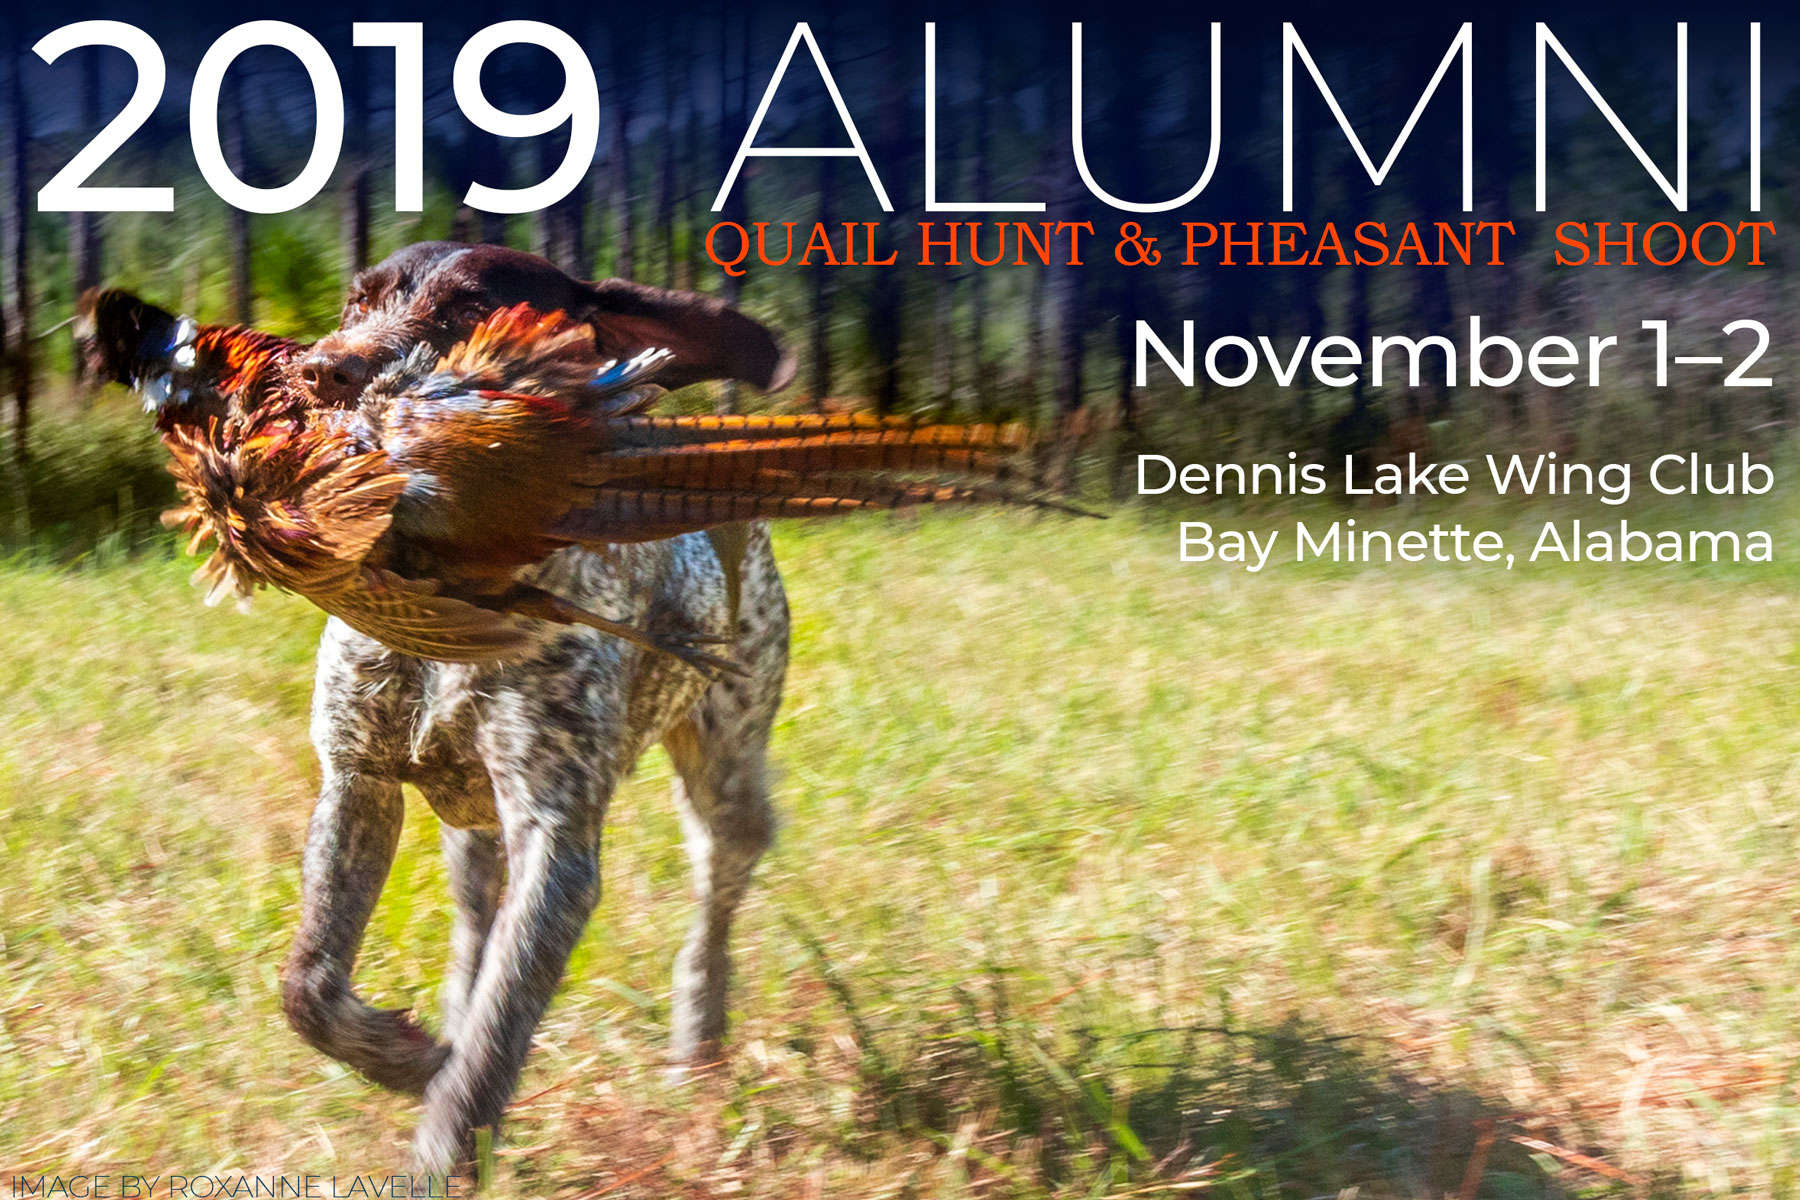 decorative image of 2019-Pheasant-Hunt-cover , Pheasant Shoot & Quail Hunt 2019 2019-11-04 09:58:23